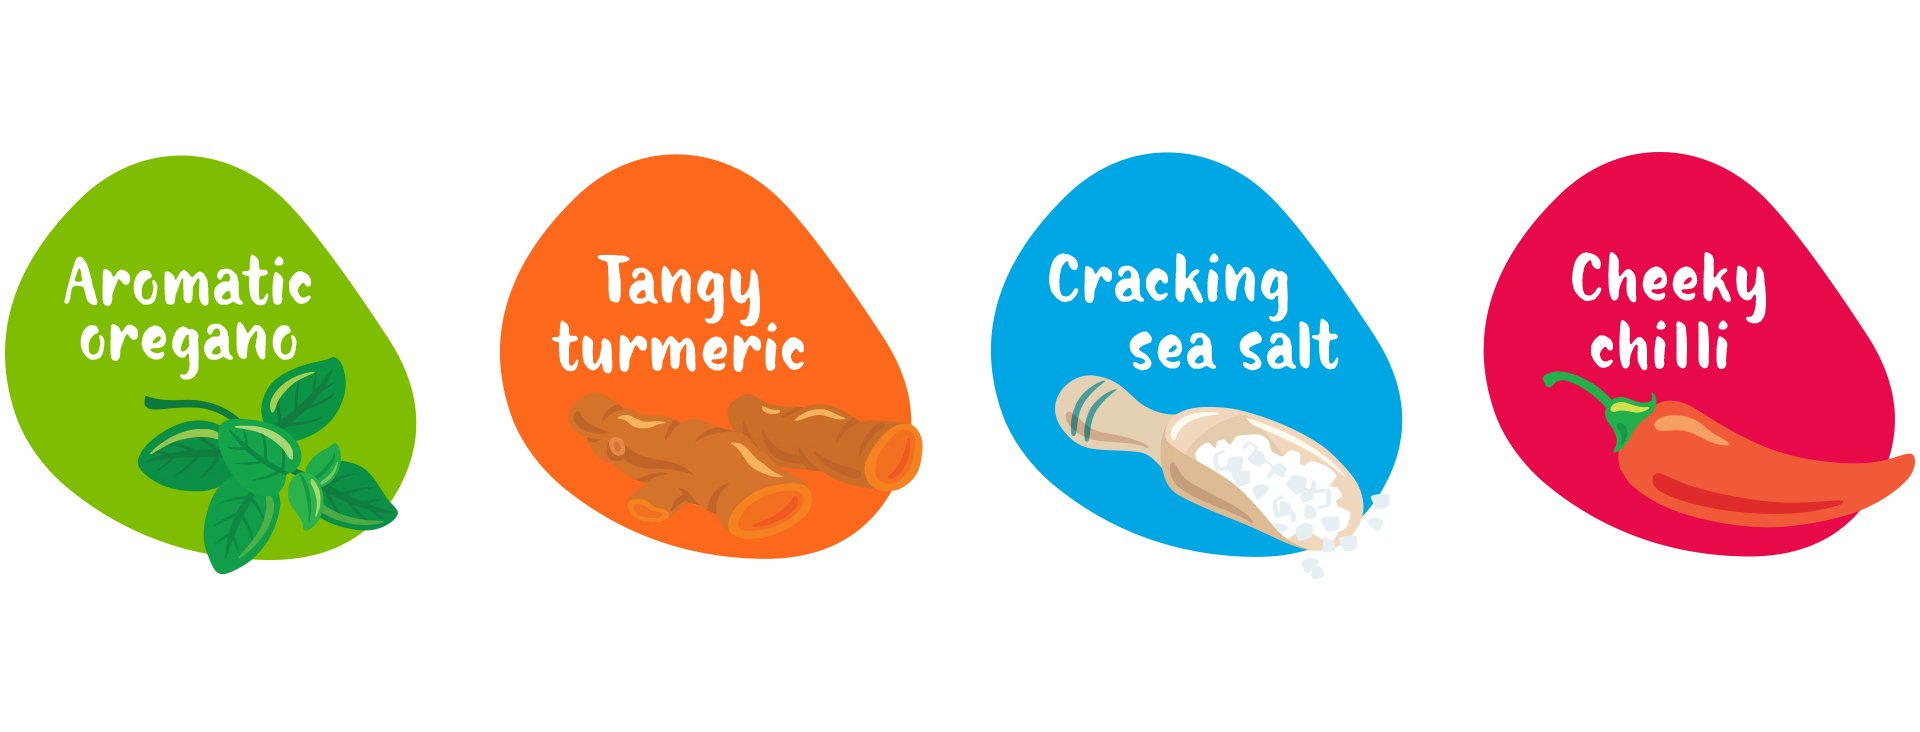 superfood packaging illustration Beanopini